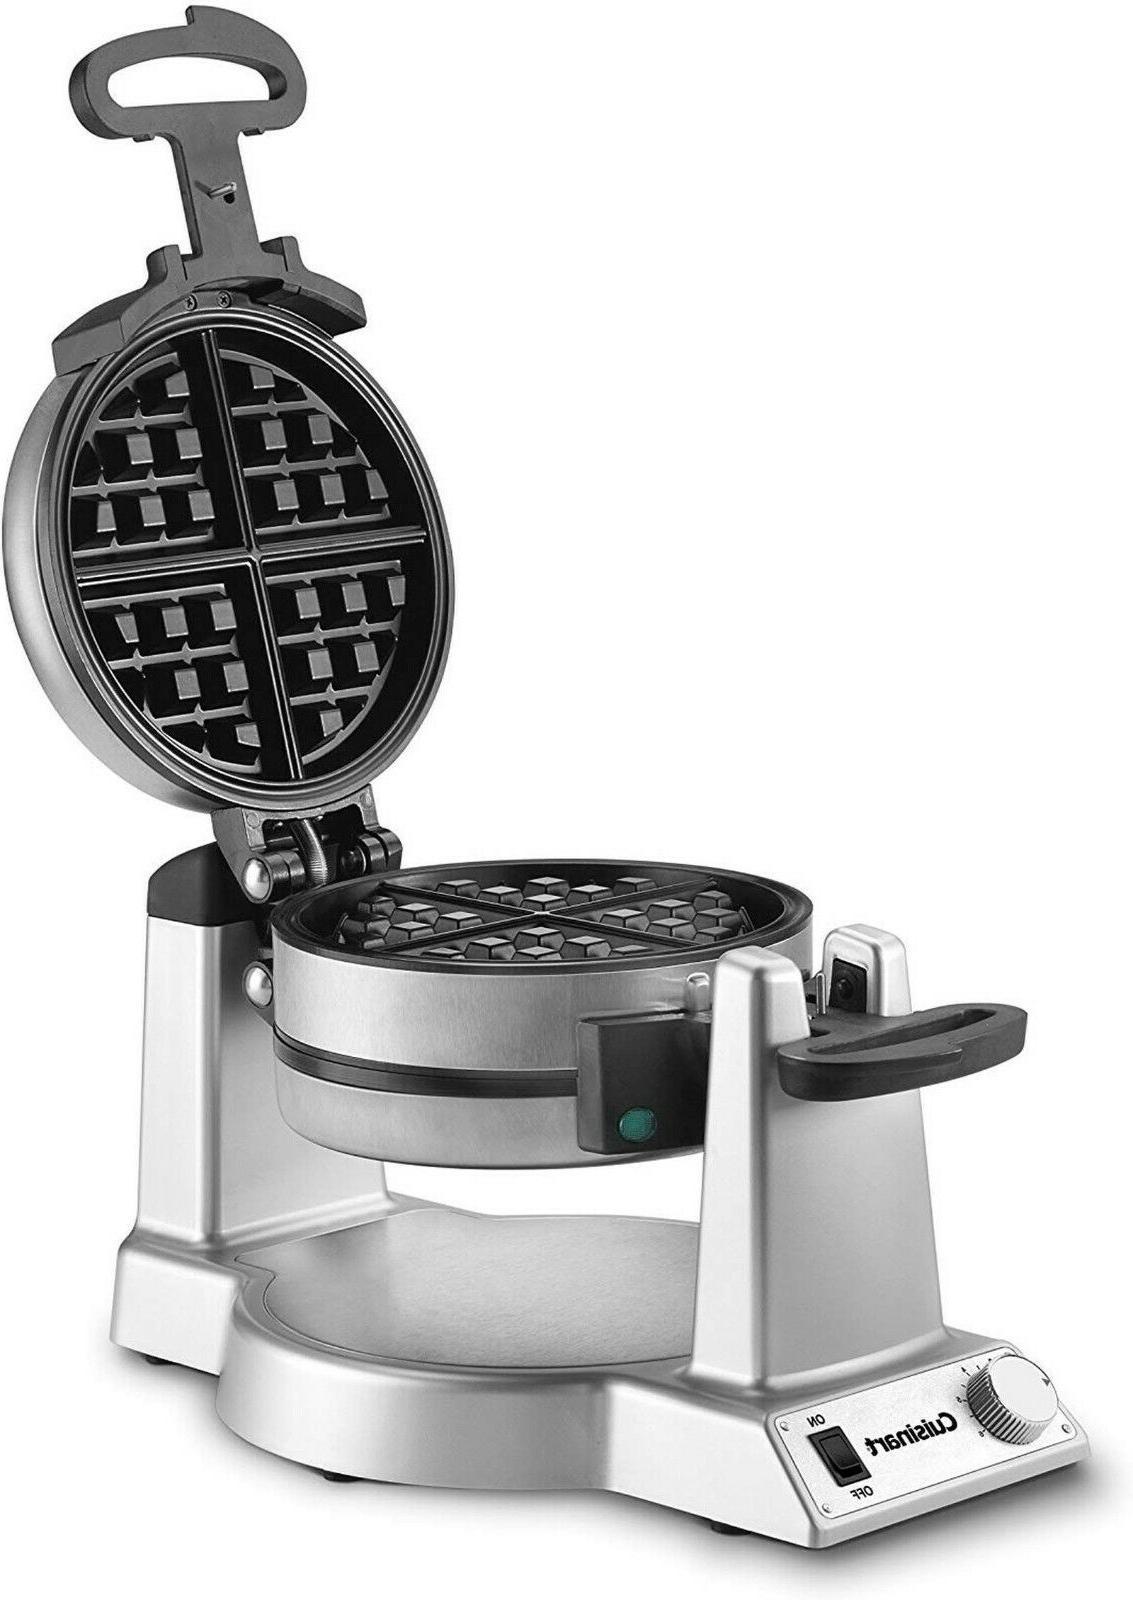 Waring Pro Double Belgian Waffle Maker Machine Commercial Ba